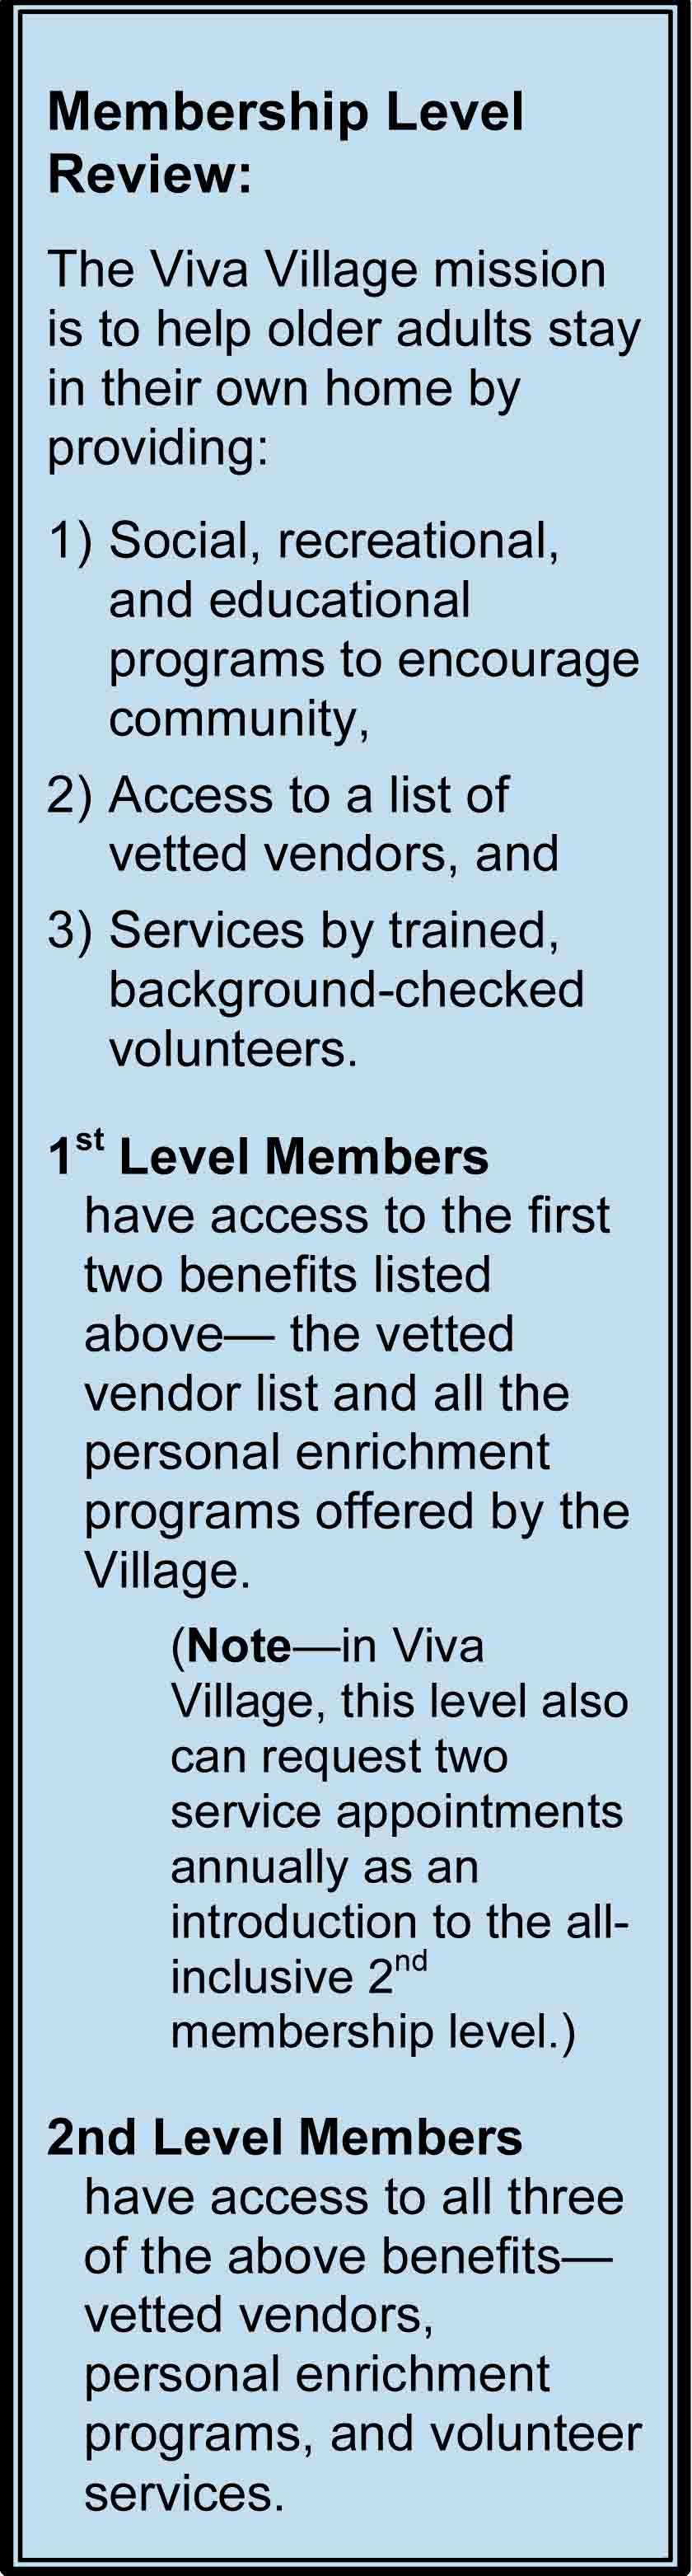 Viva Village Membership Levels